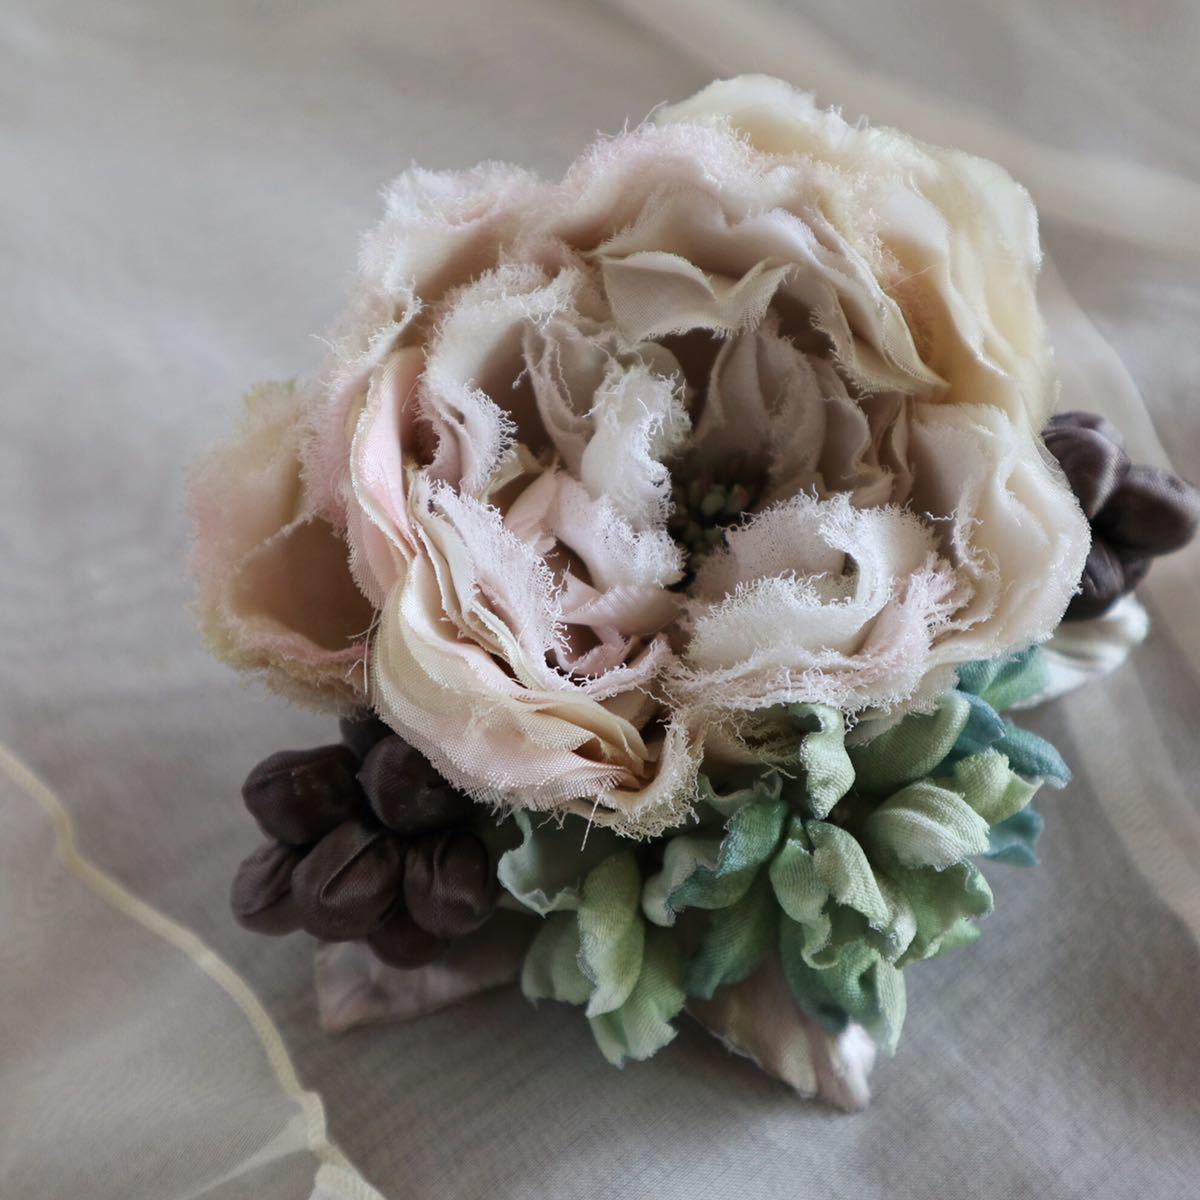 *kashun* ハンドメイド 布花のアンティークカラーのミニブーケ風コサージュ6 ピンクのバラとアジサイ /染花/卒園式/卒業式/入学式_画像4